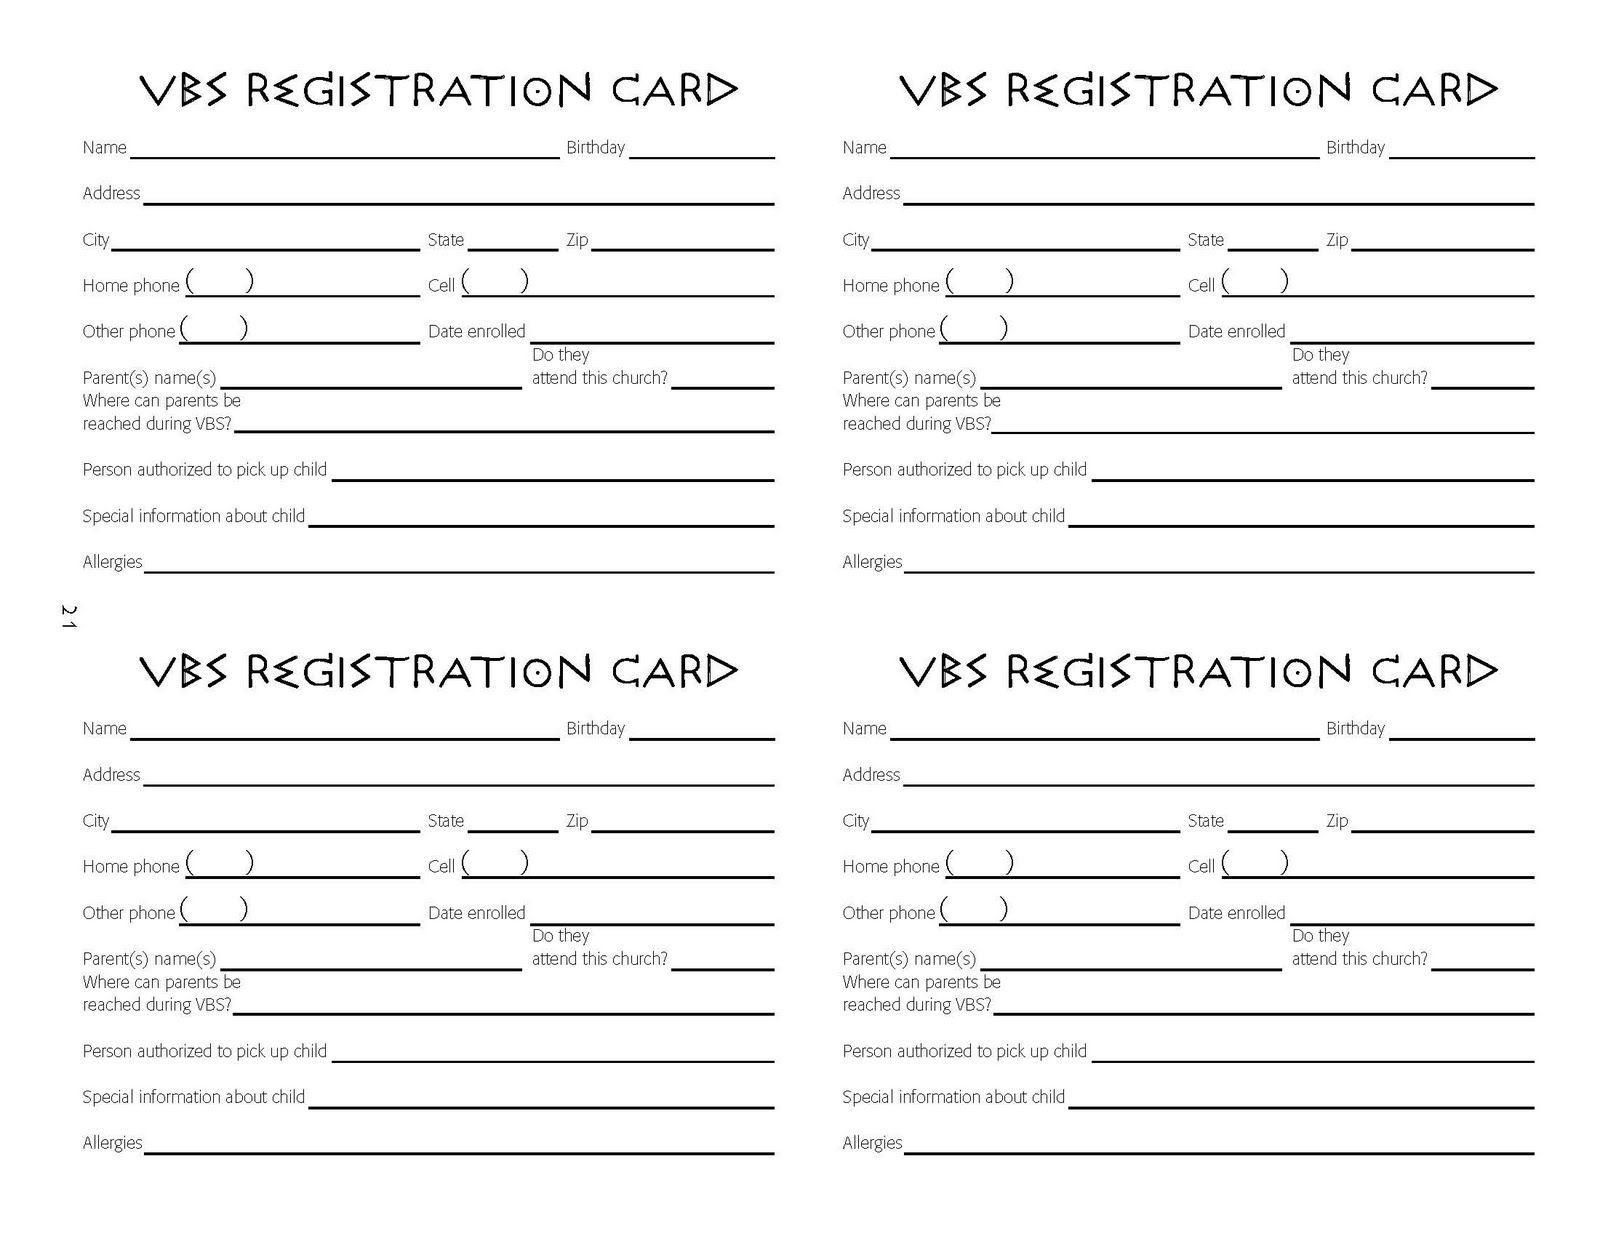 VBS+Registration+Cards.jpg 1,600×1,236 pixels | VBS Saturday ...